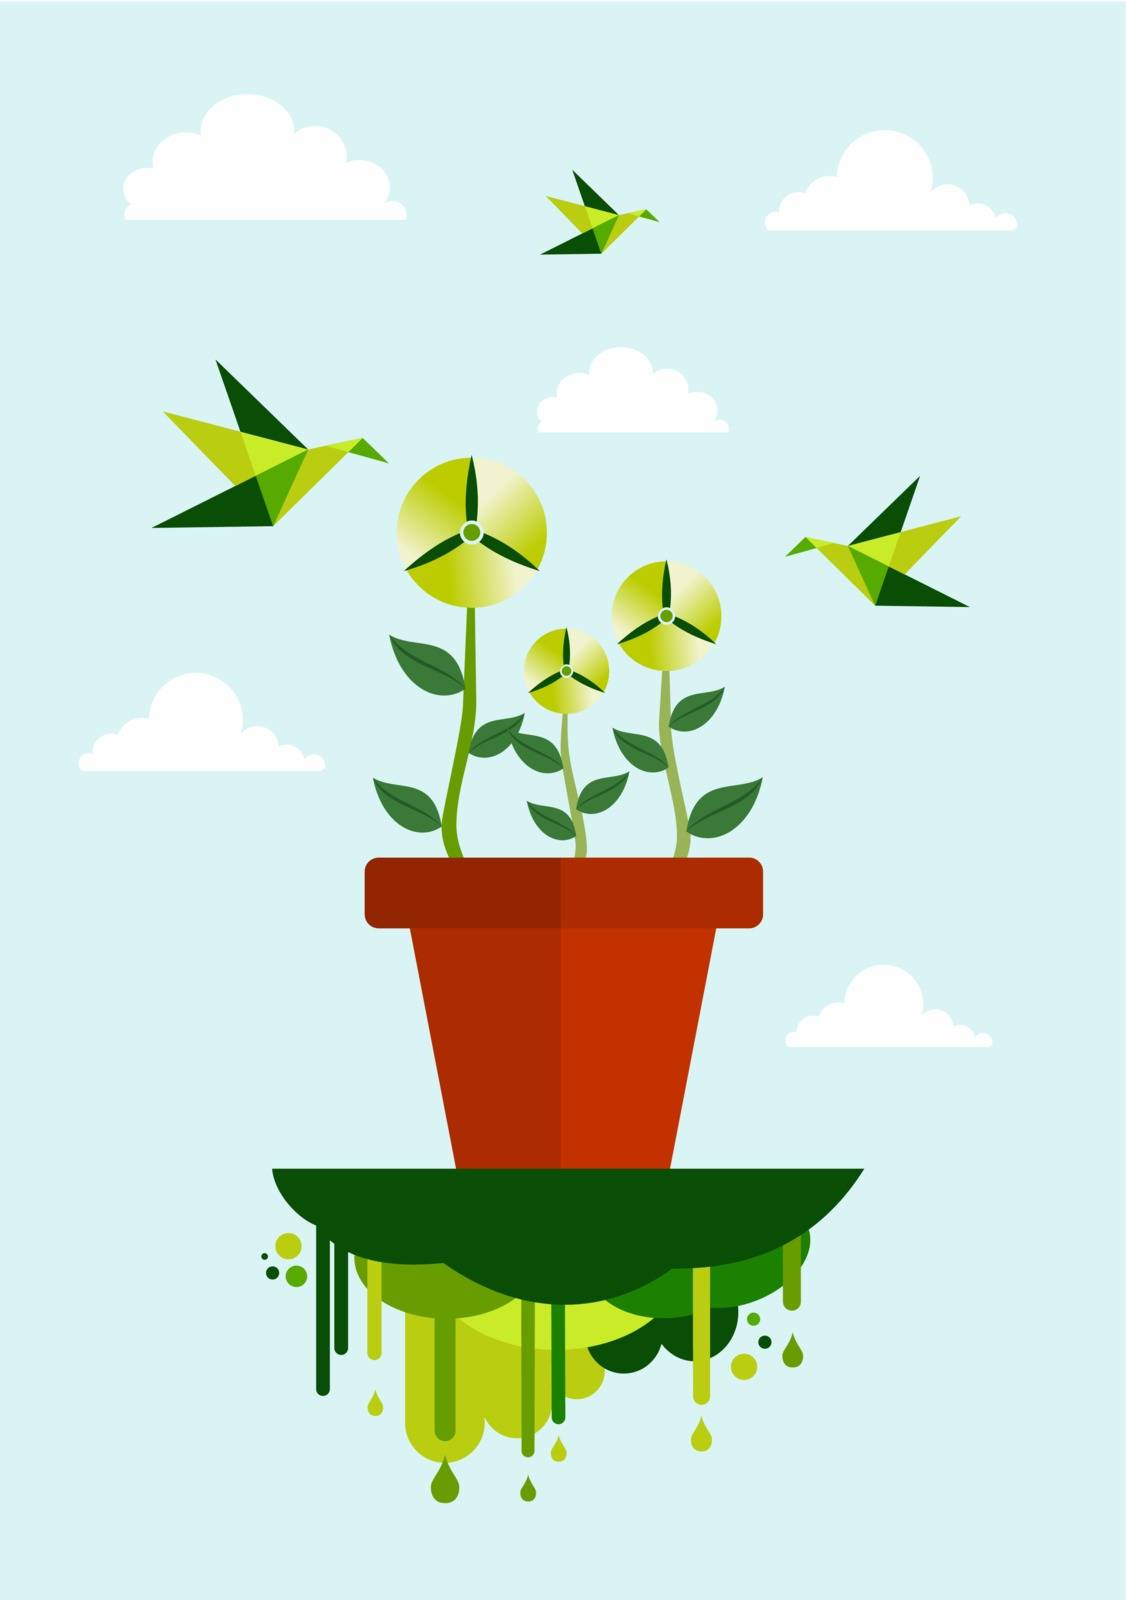 umwelt natur OEkologie energie topf pflanze